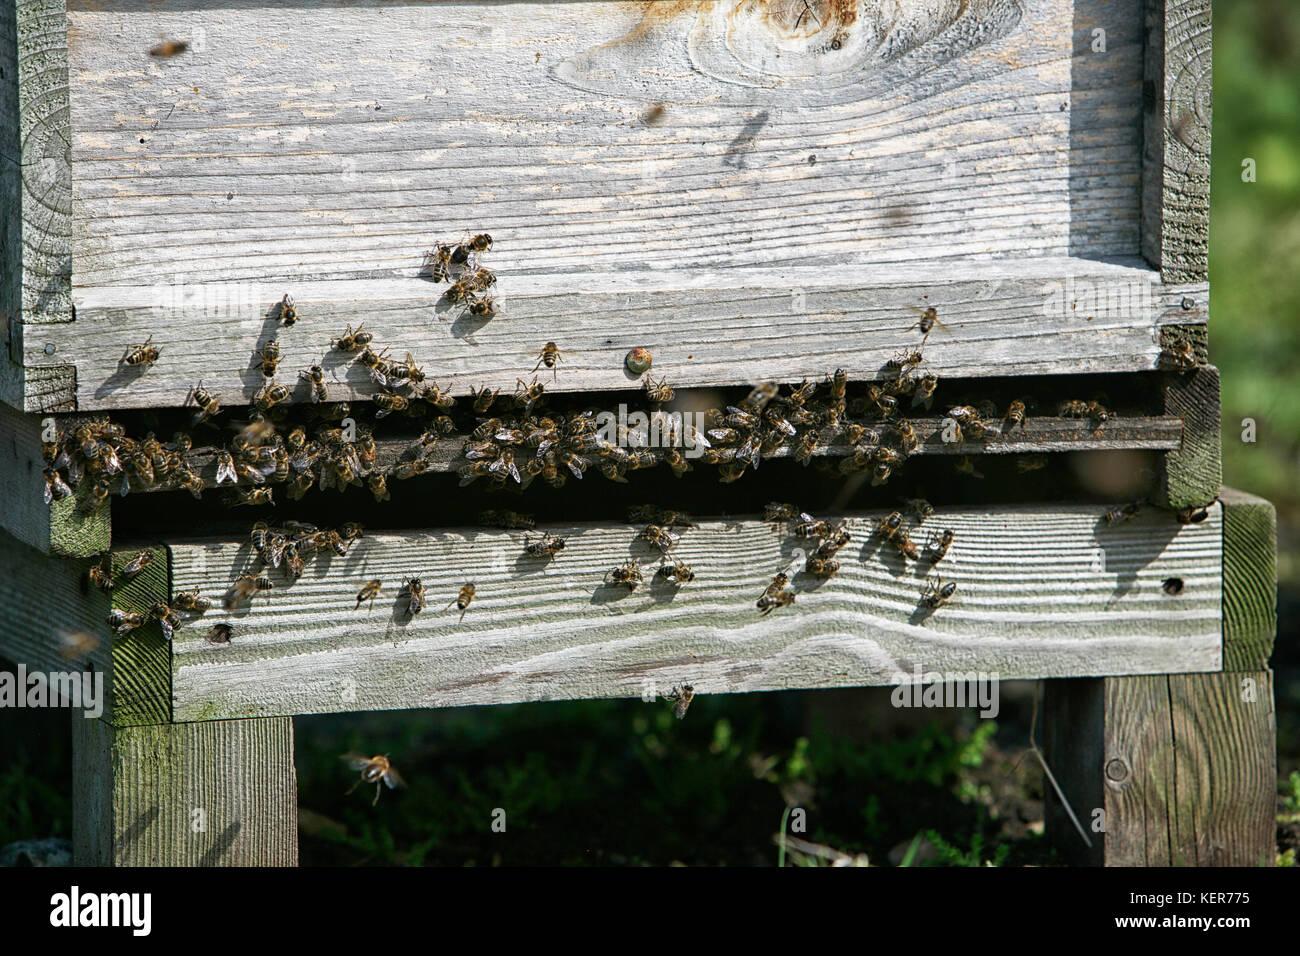 Fixed Comb Hives Stock Photos & Fixed Comb Hives Stock